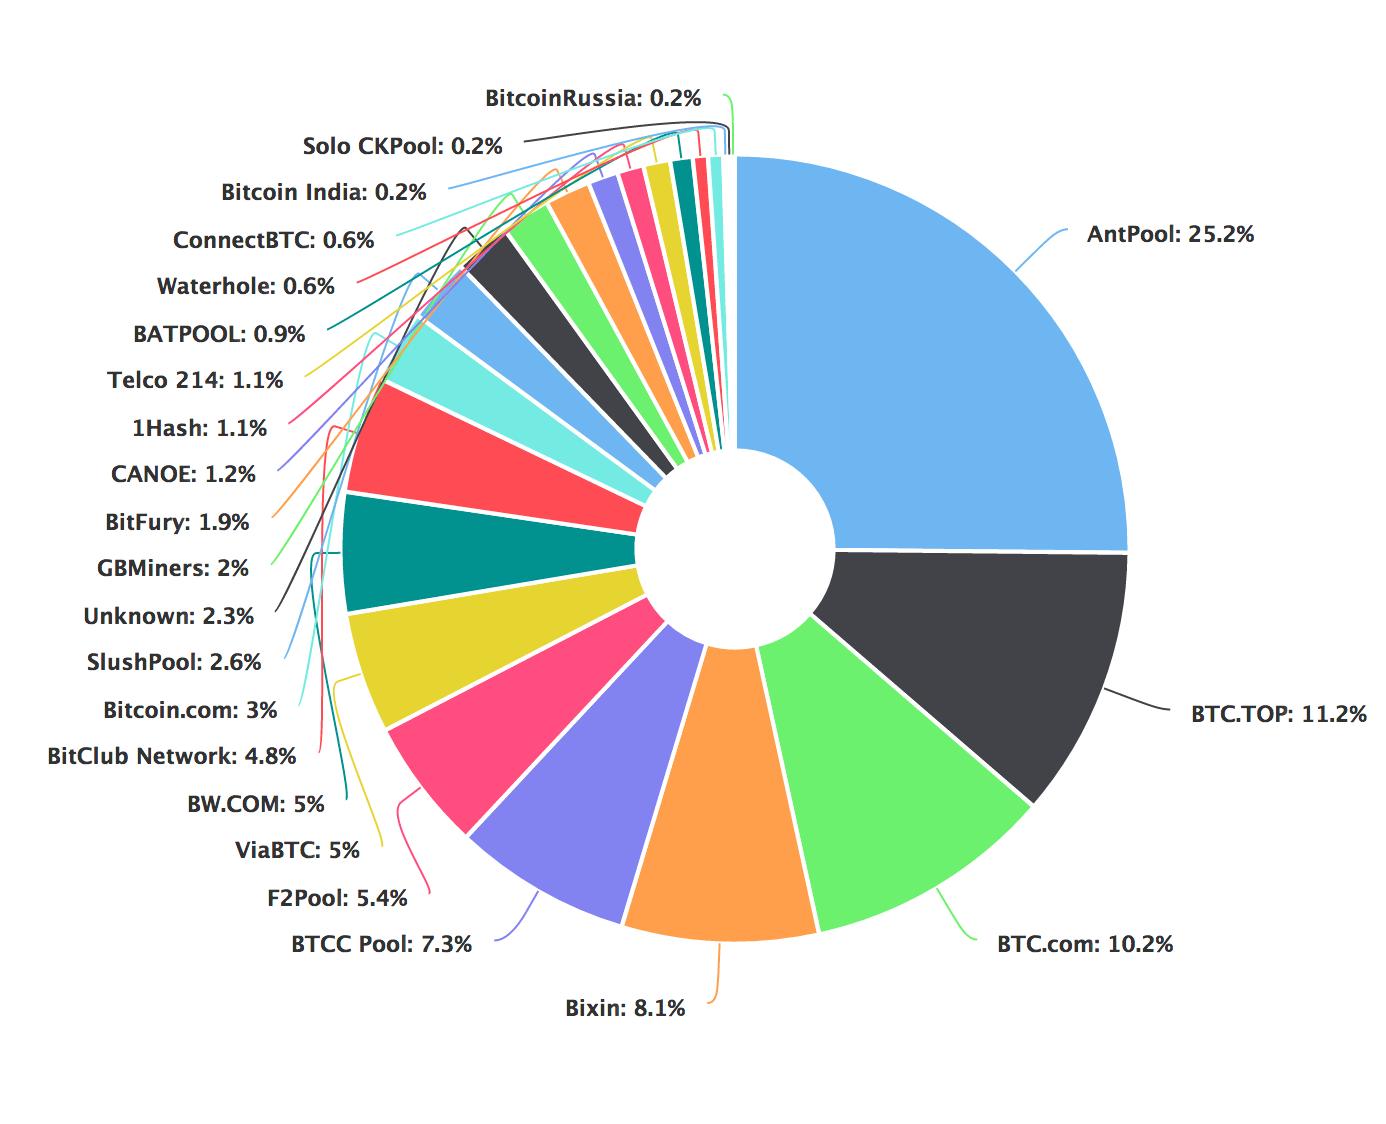 Mining pools including bitclub network